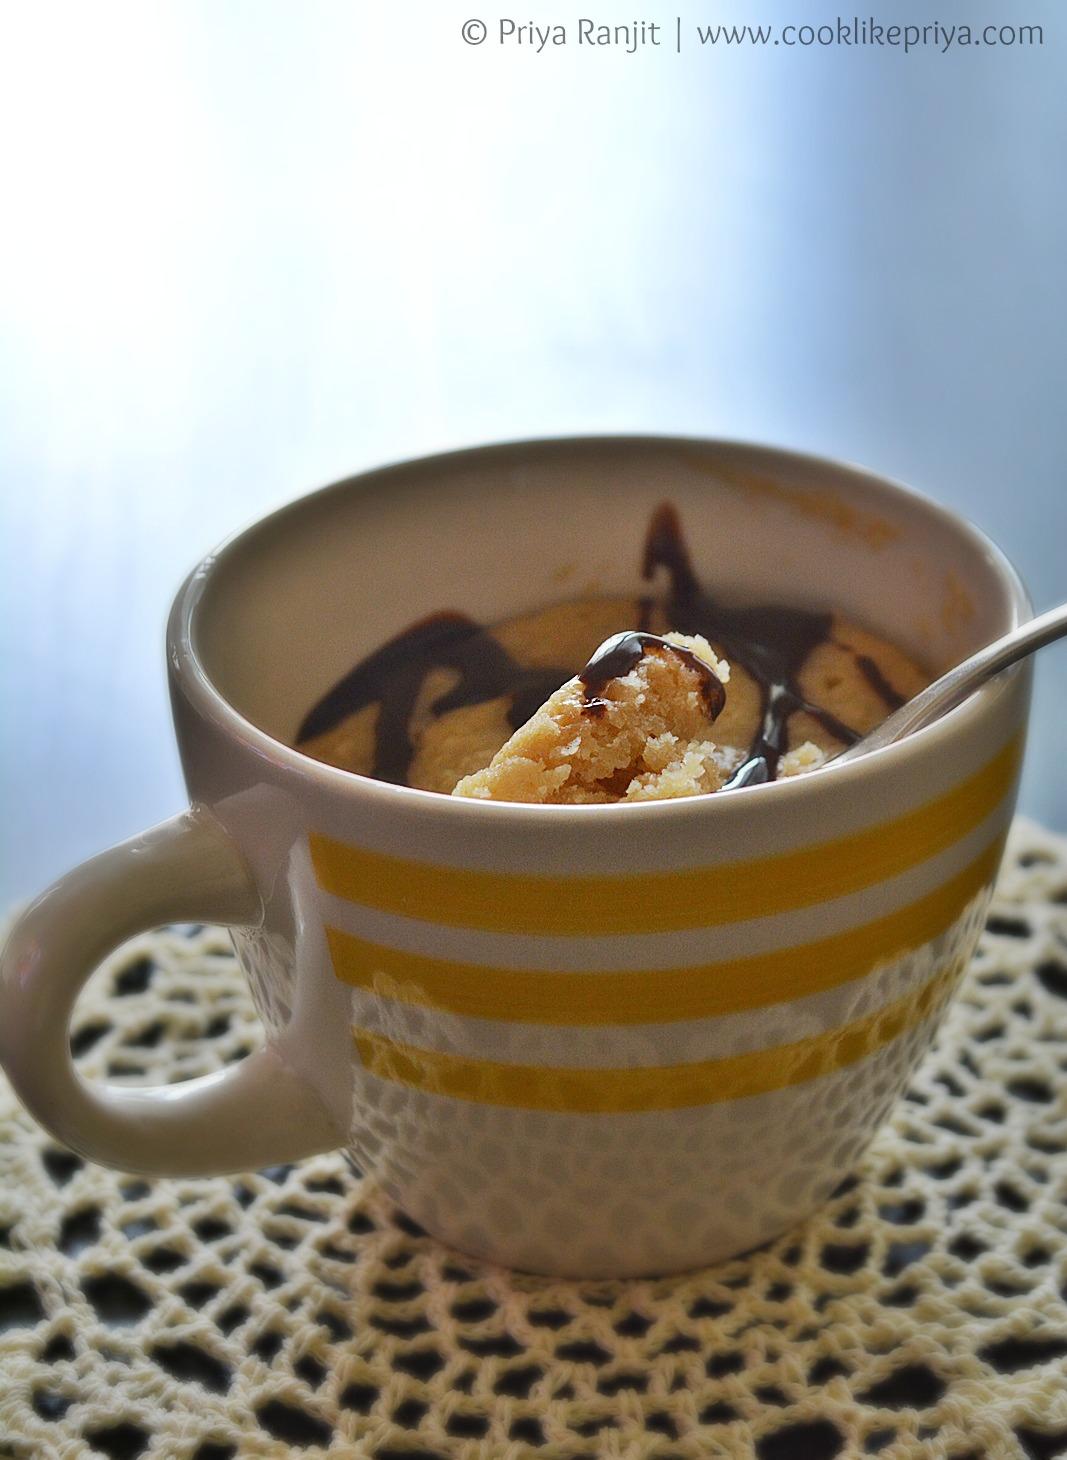 Vanilla microwave mug cake recipe